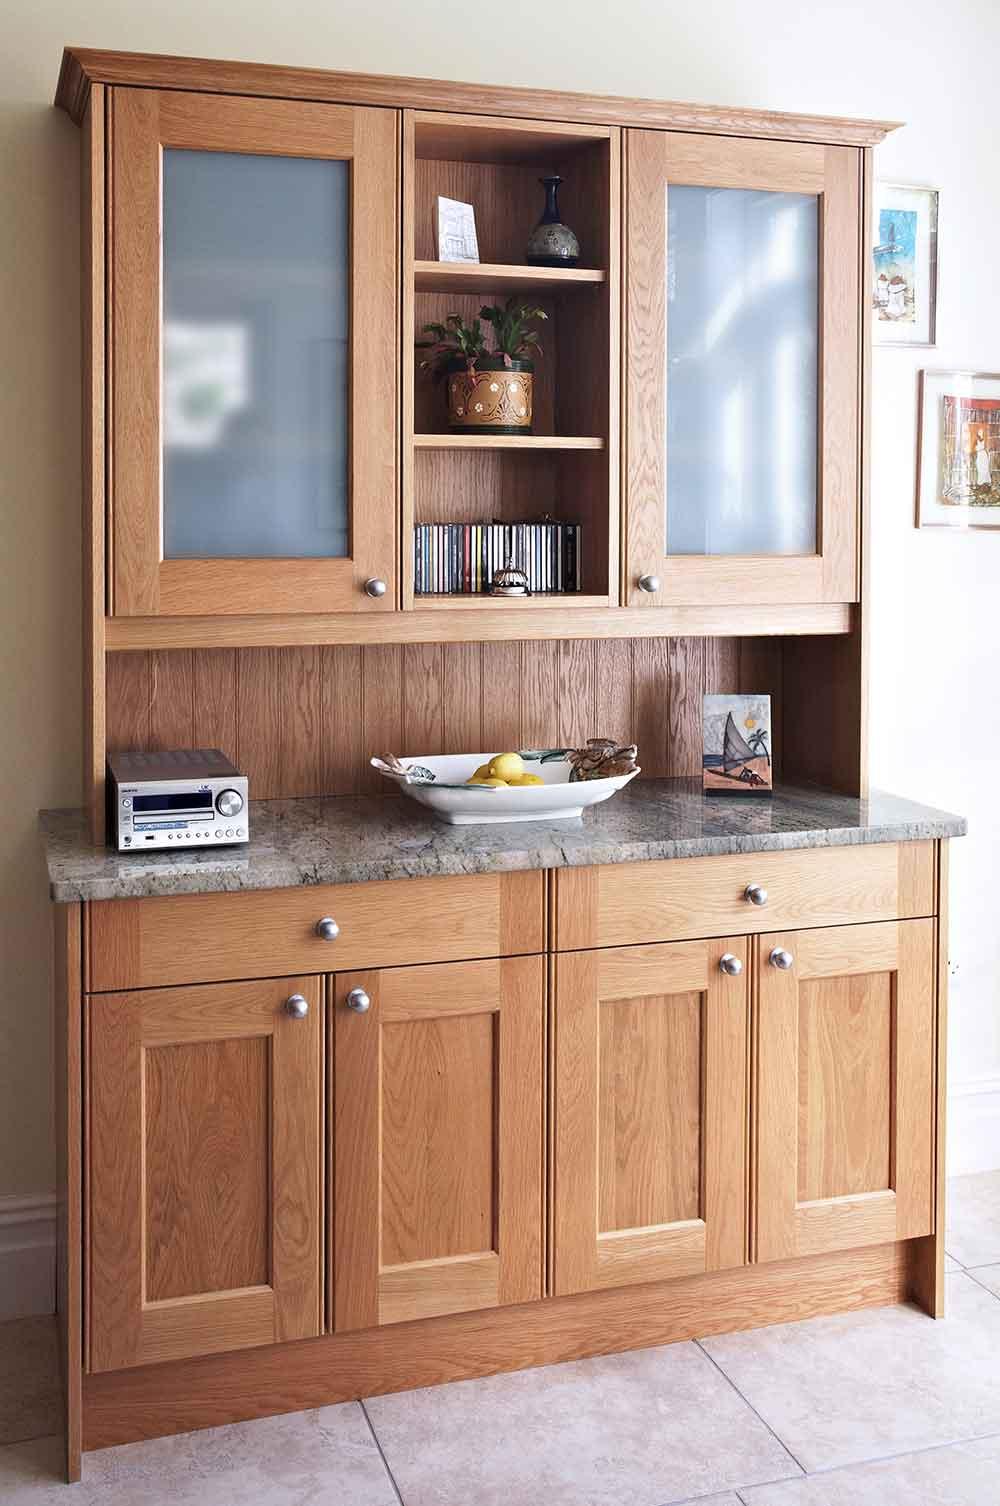 Bespoke lavish kitchen detail